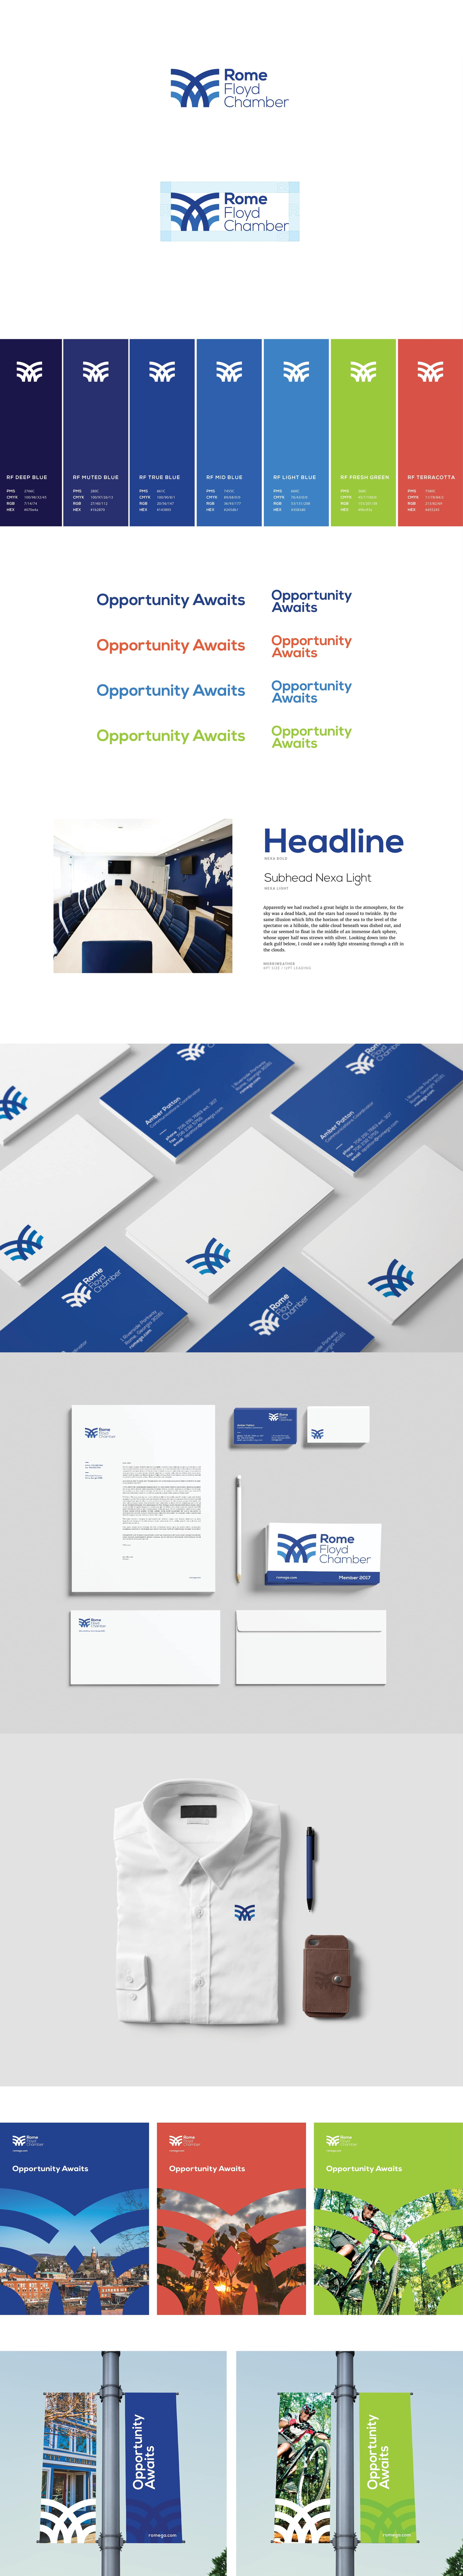 rome floyd chamber brand identity design